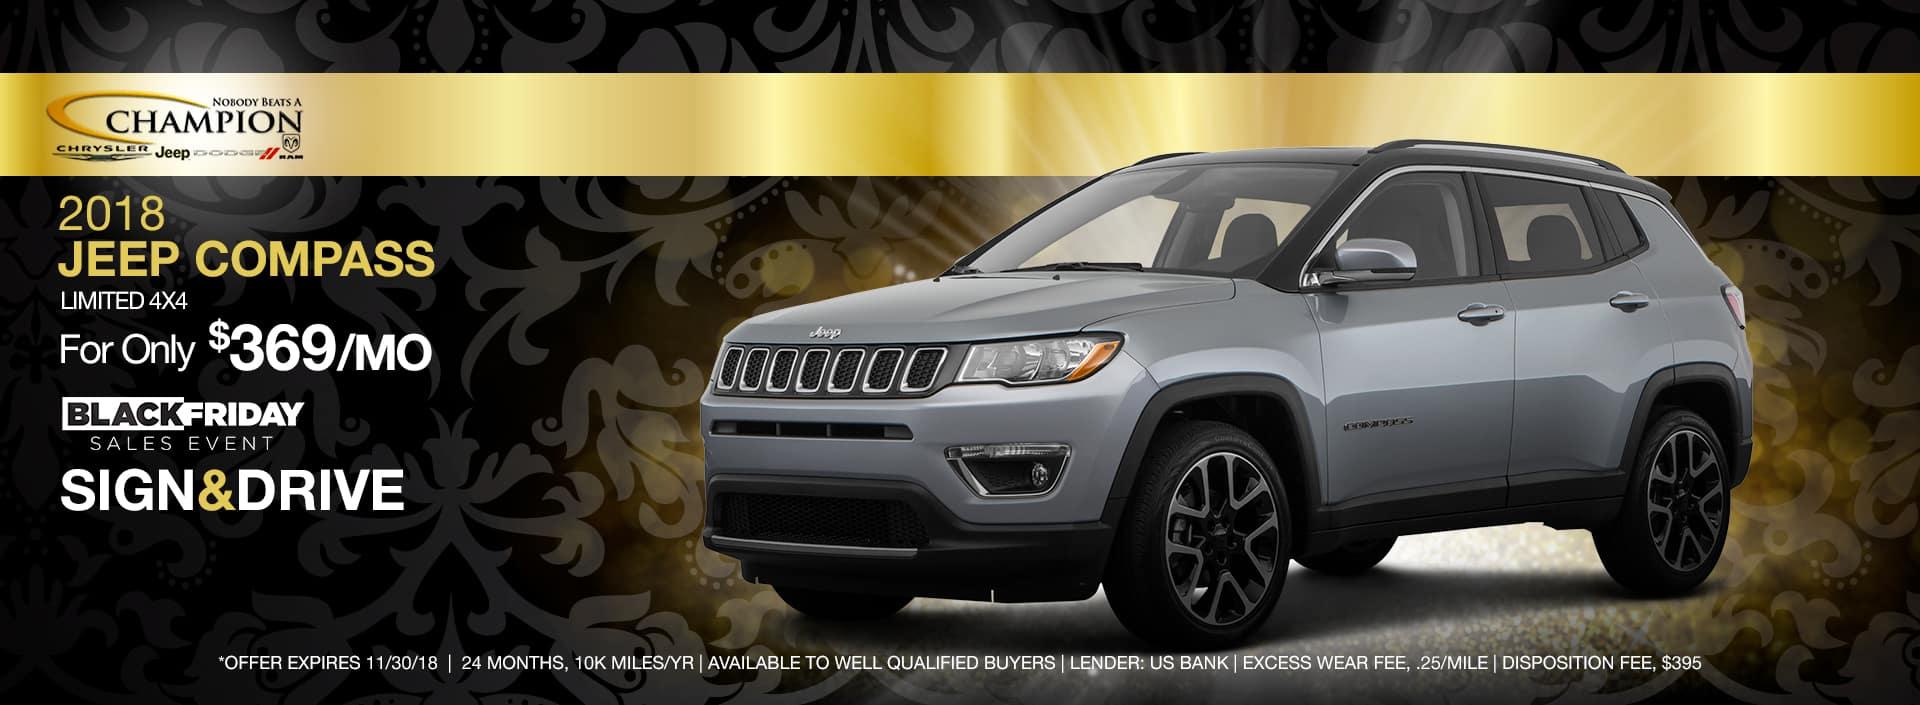 2018 Jeep Compass Black Friday Sale